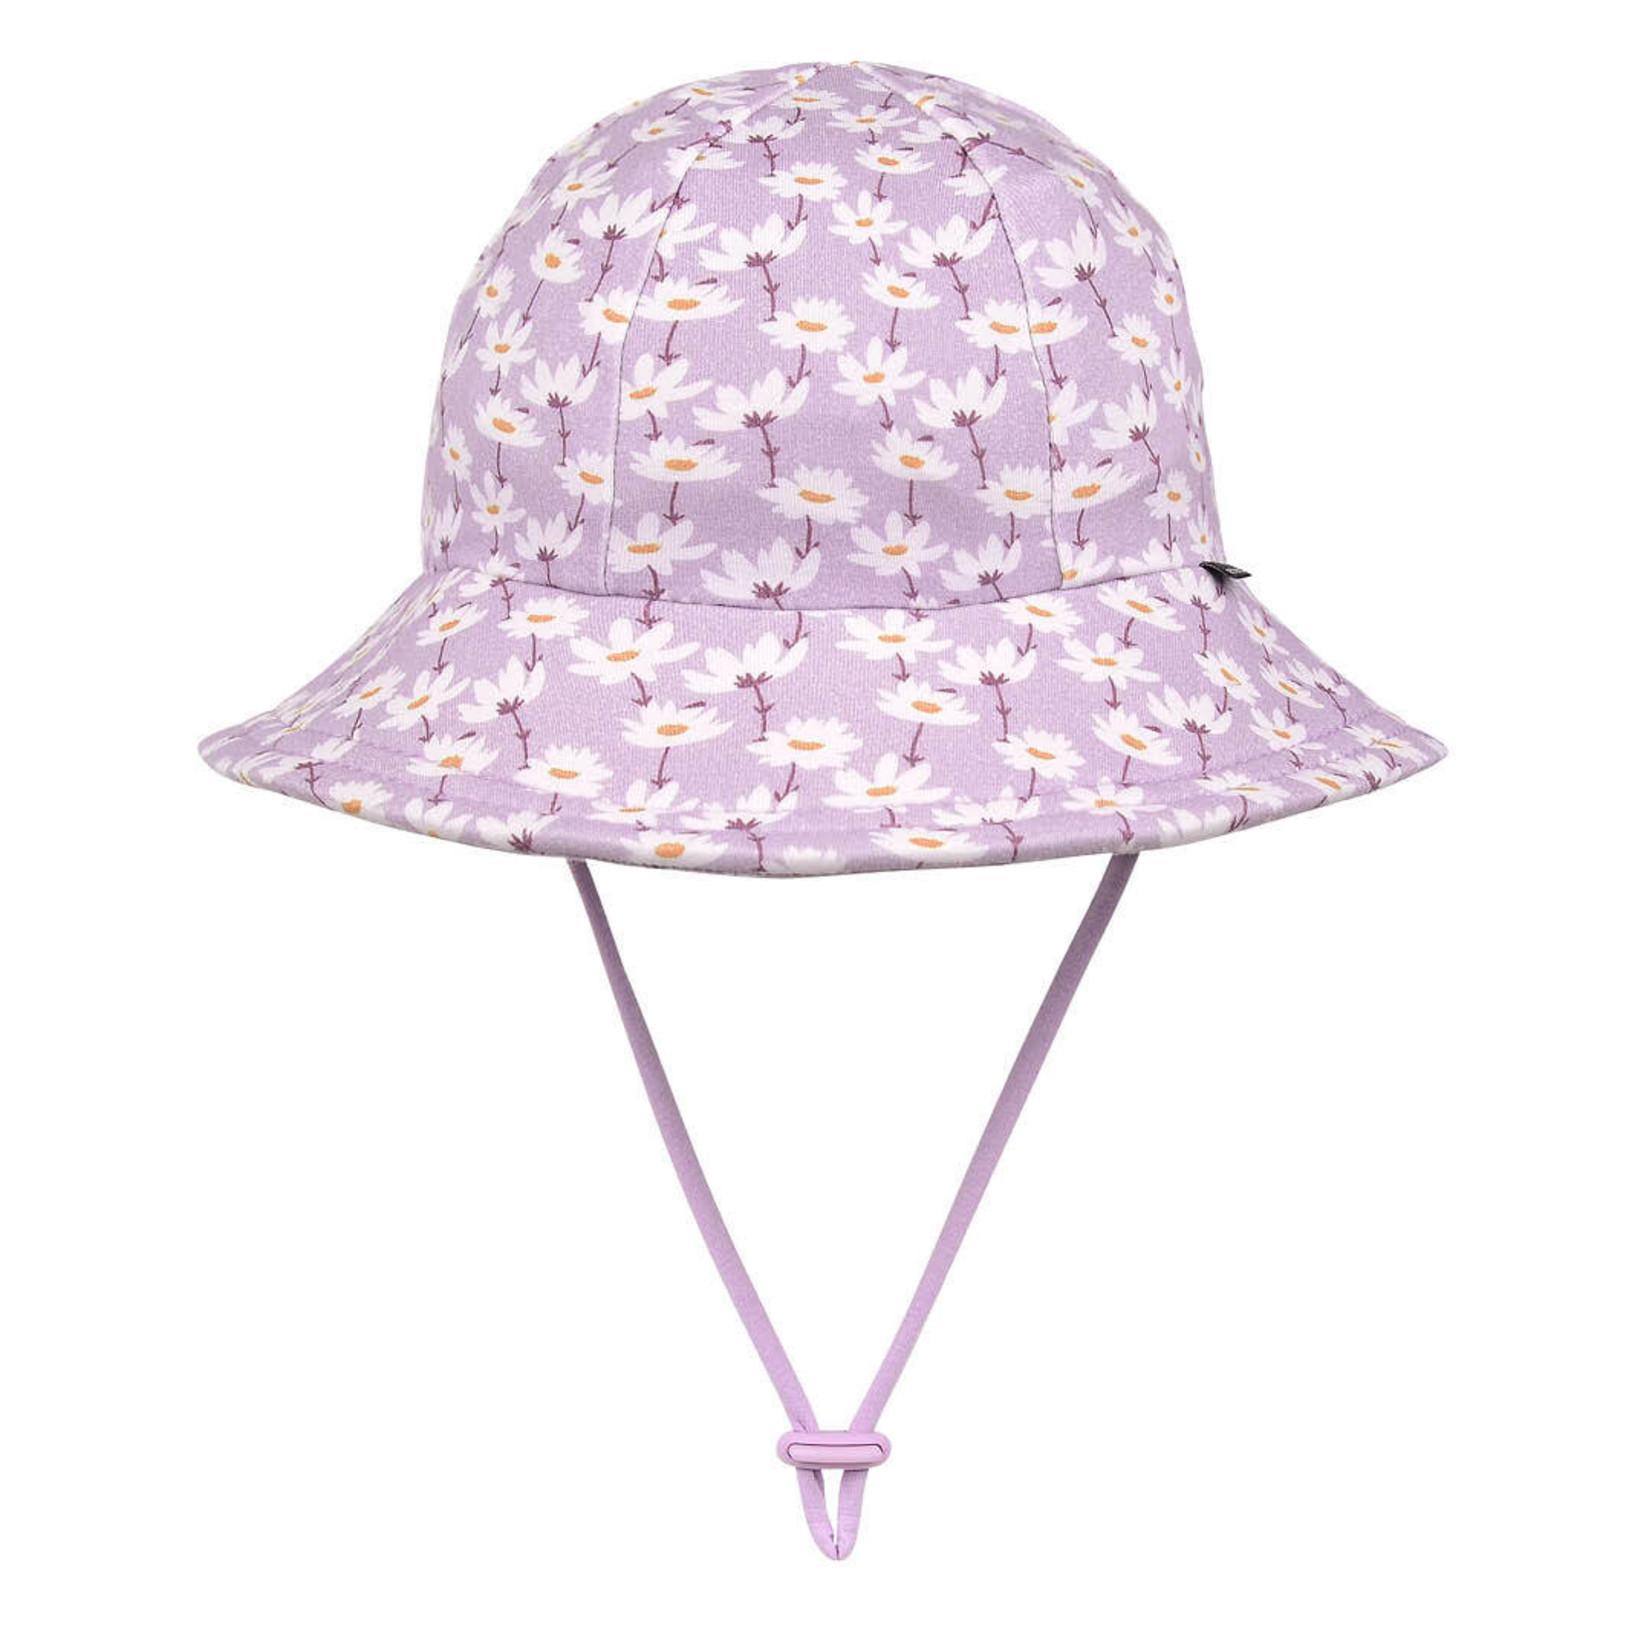 Bedhead Hats Bedhead Toddler Bucket Hat - Cosmos